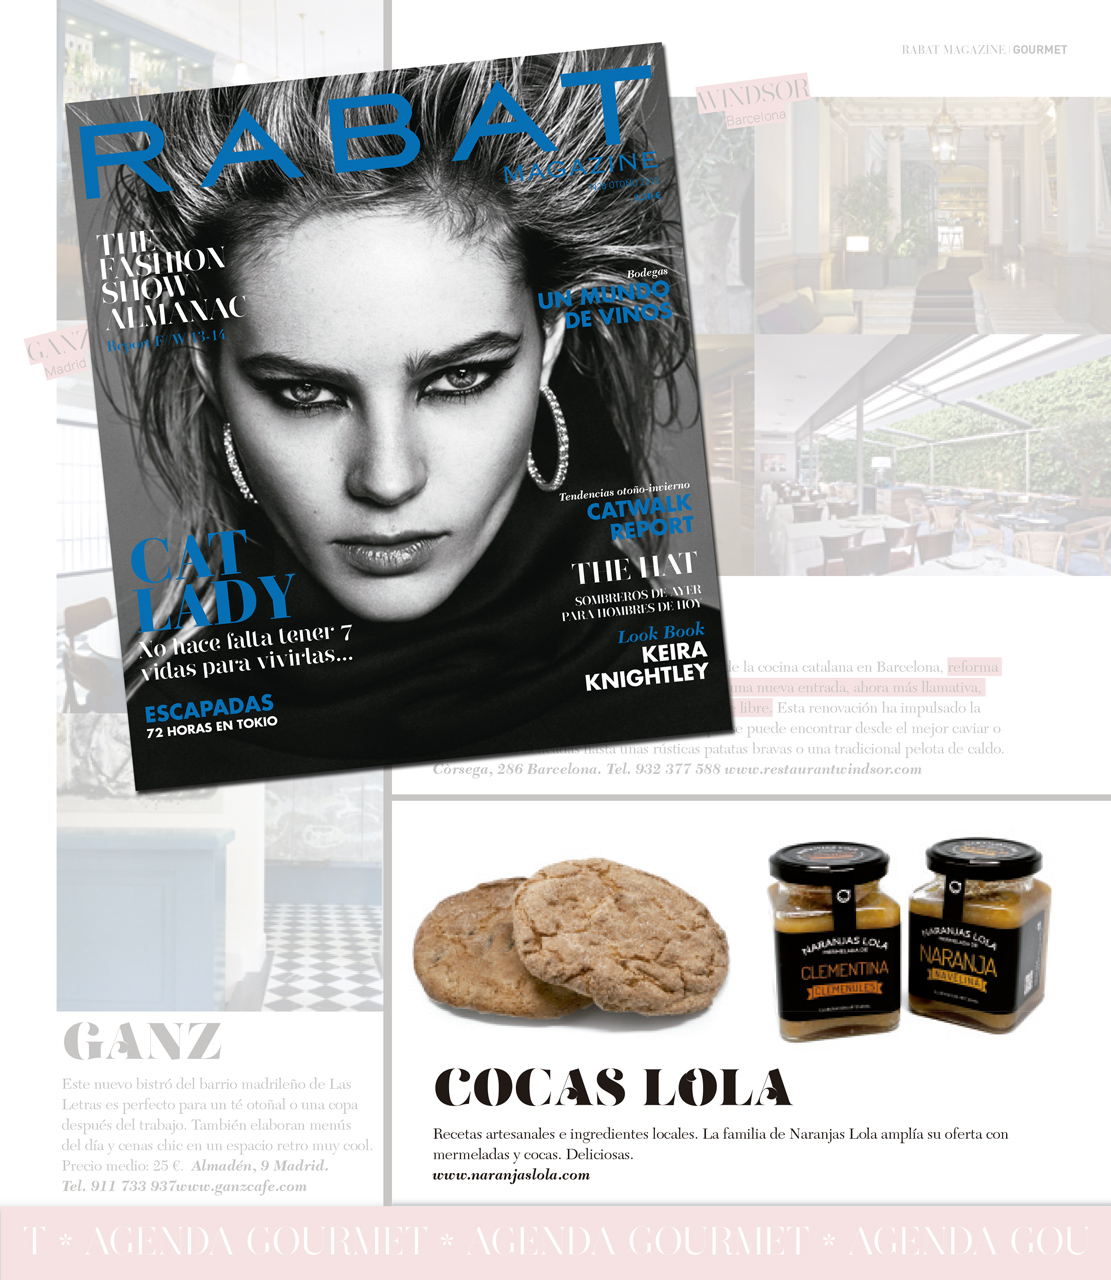 Naranjas Lola en la agenda gourmet de la revista Rabat Magazine